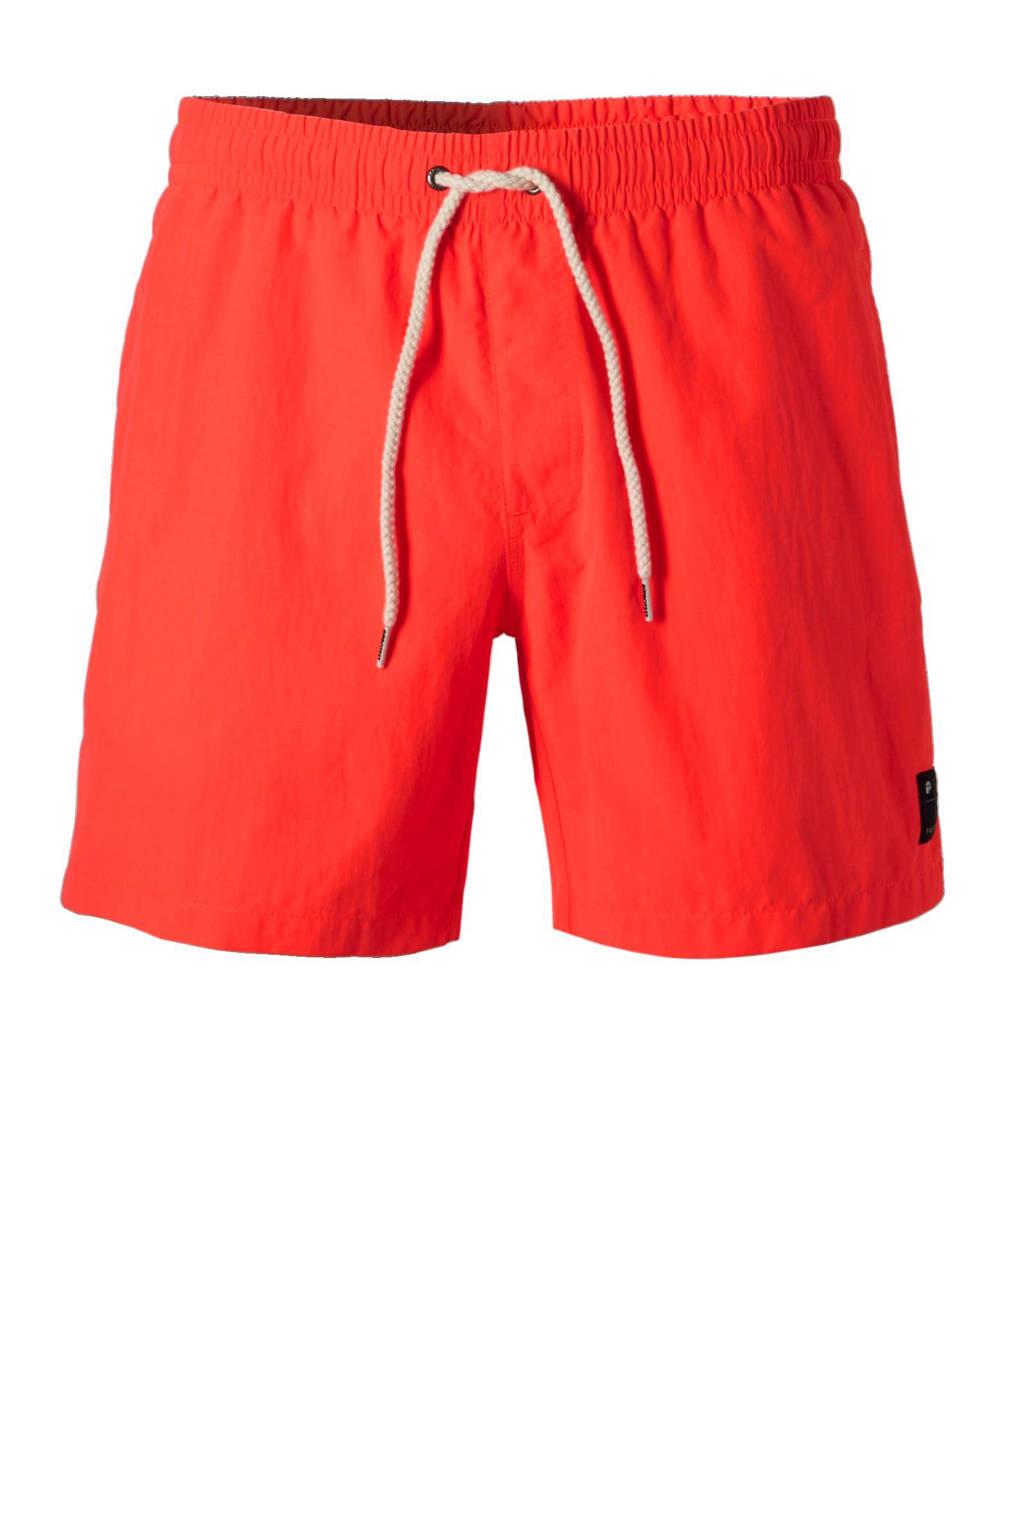 Protest zwemshort, Neon oranje